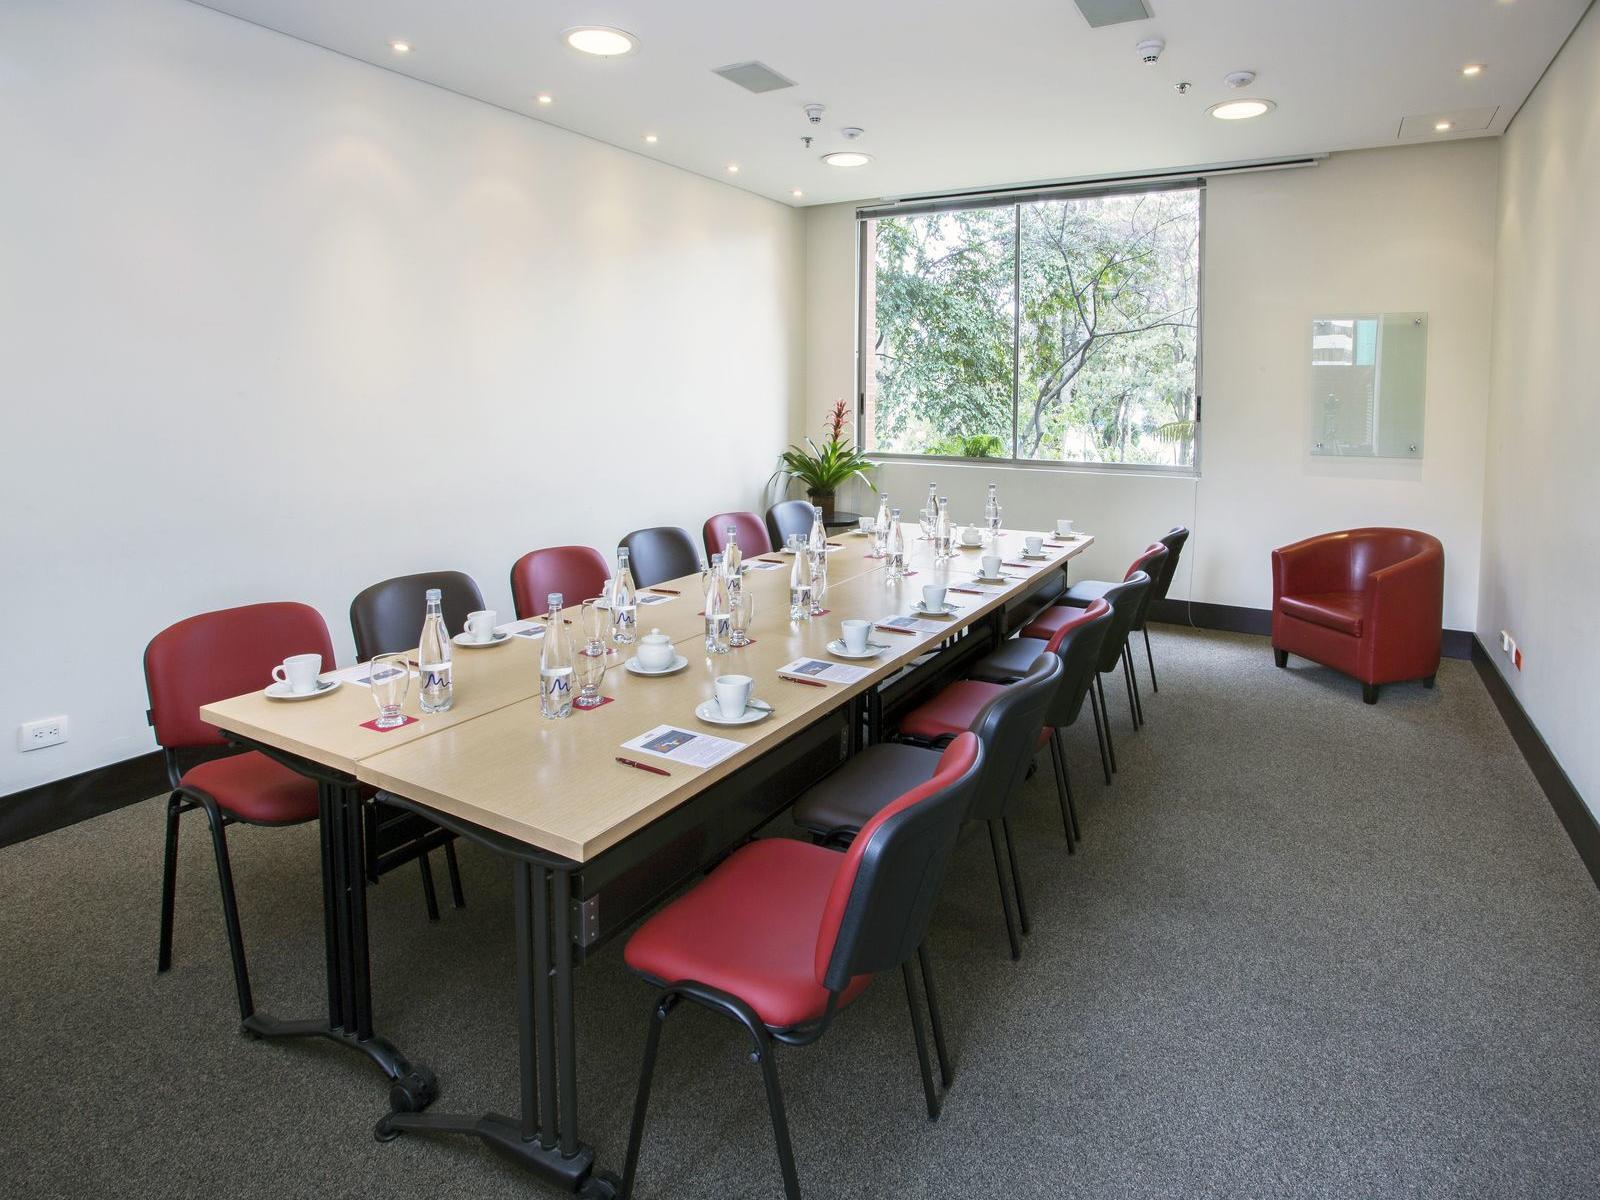 long-table boardroom setup